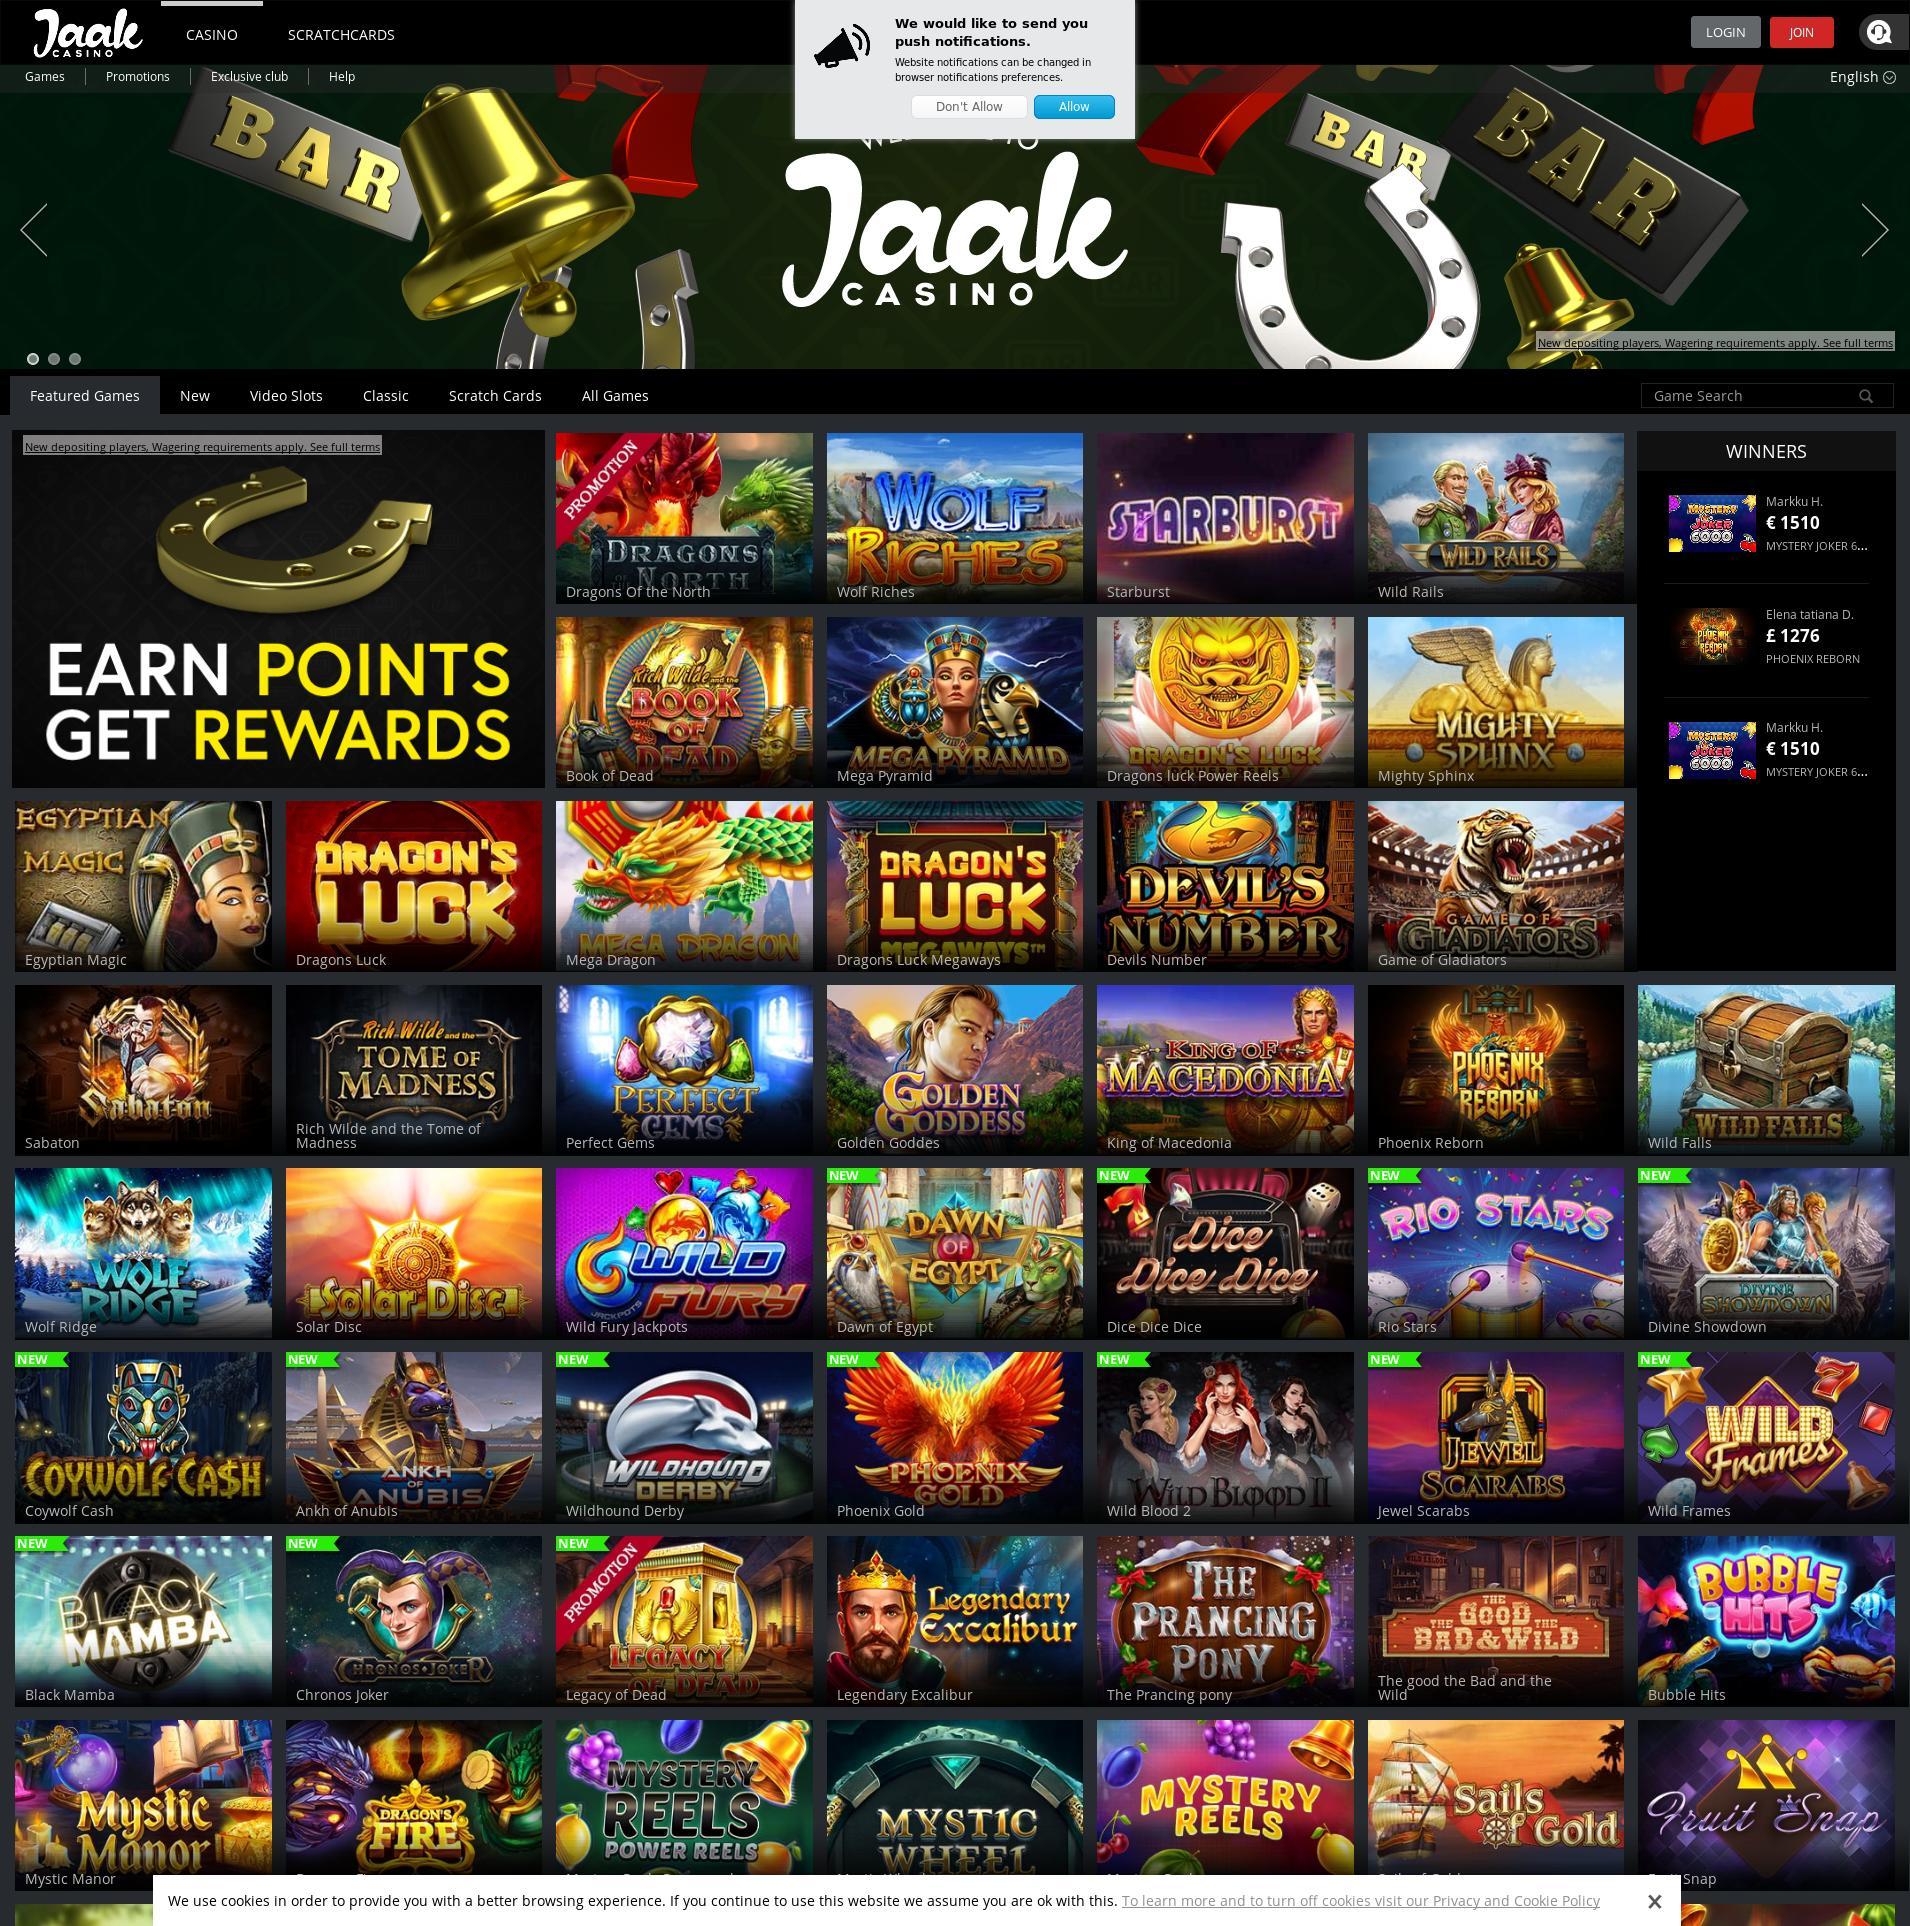 Casino screen Lobby 2020-02-21 for United Kingdom